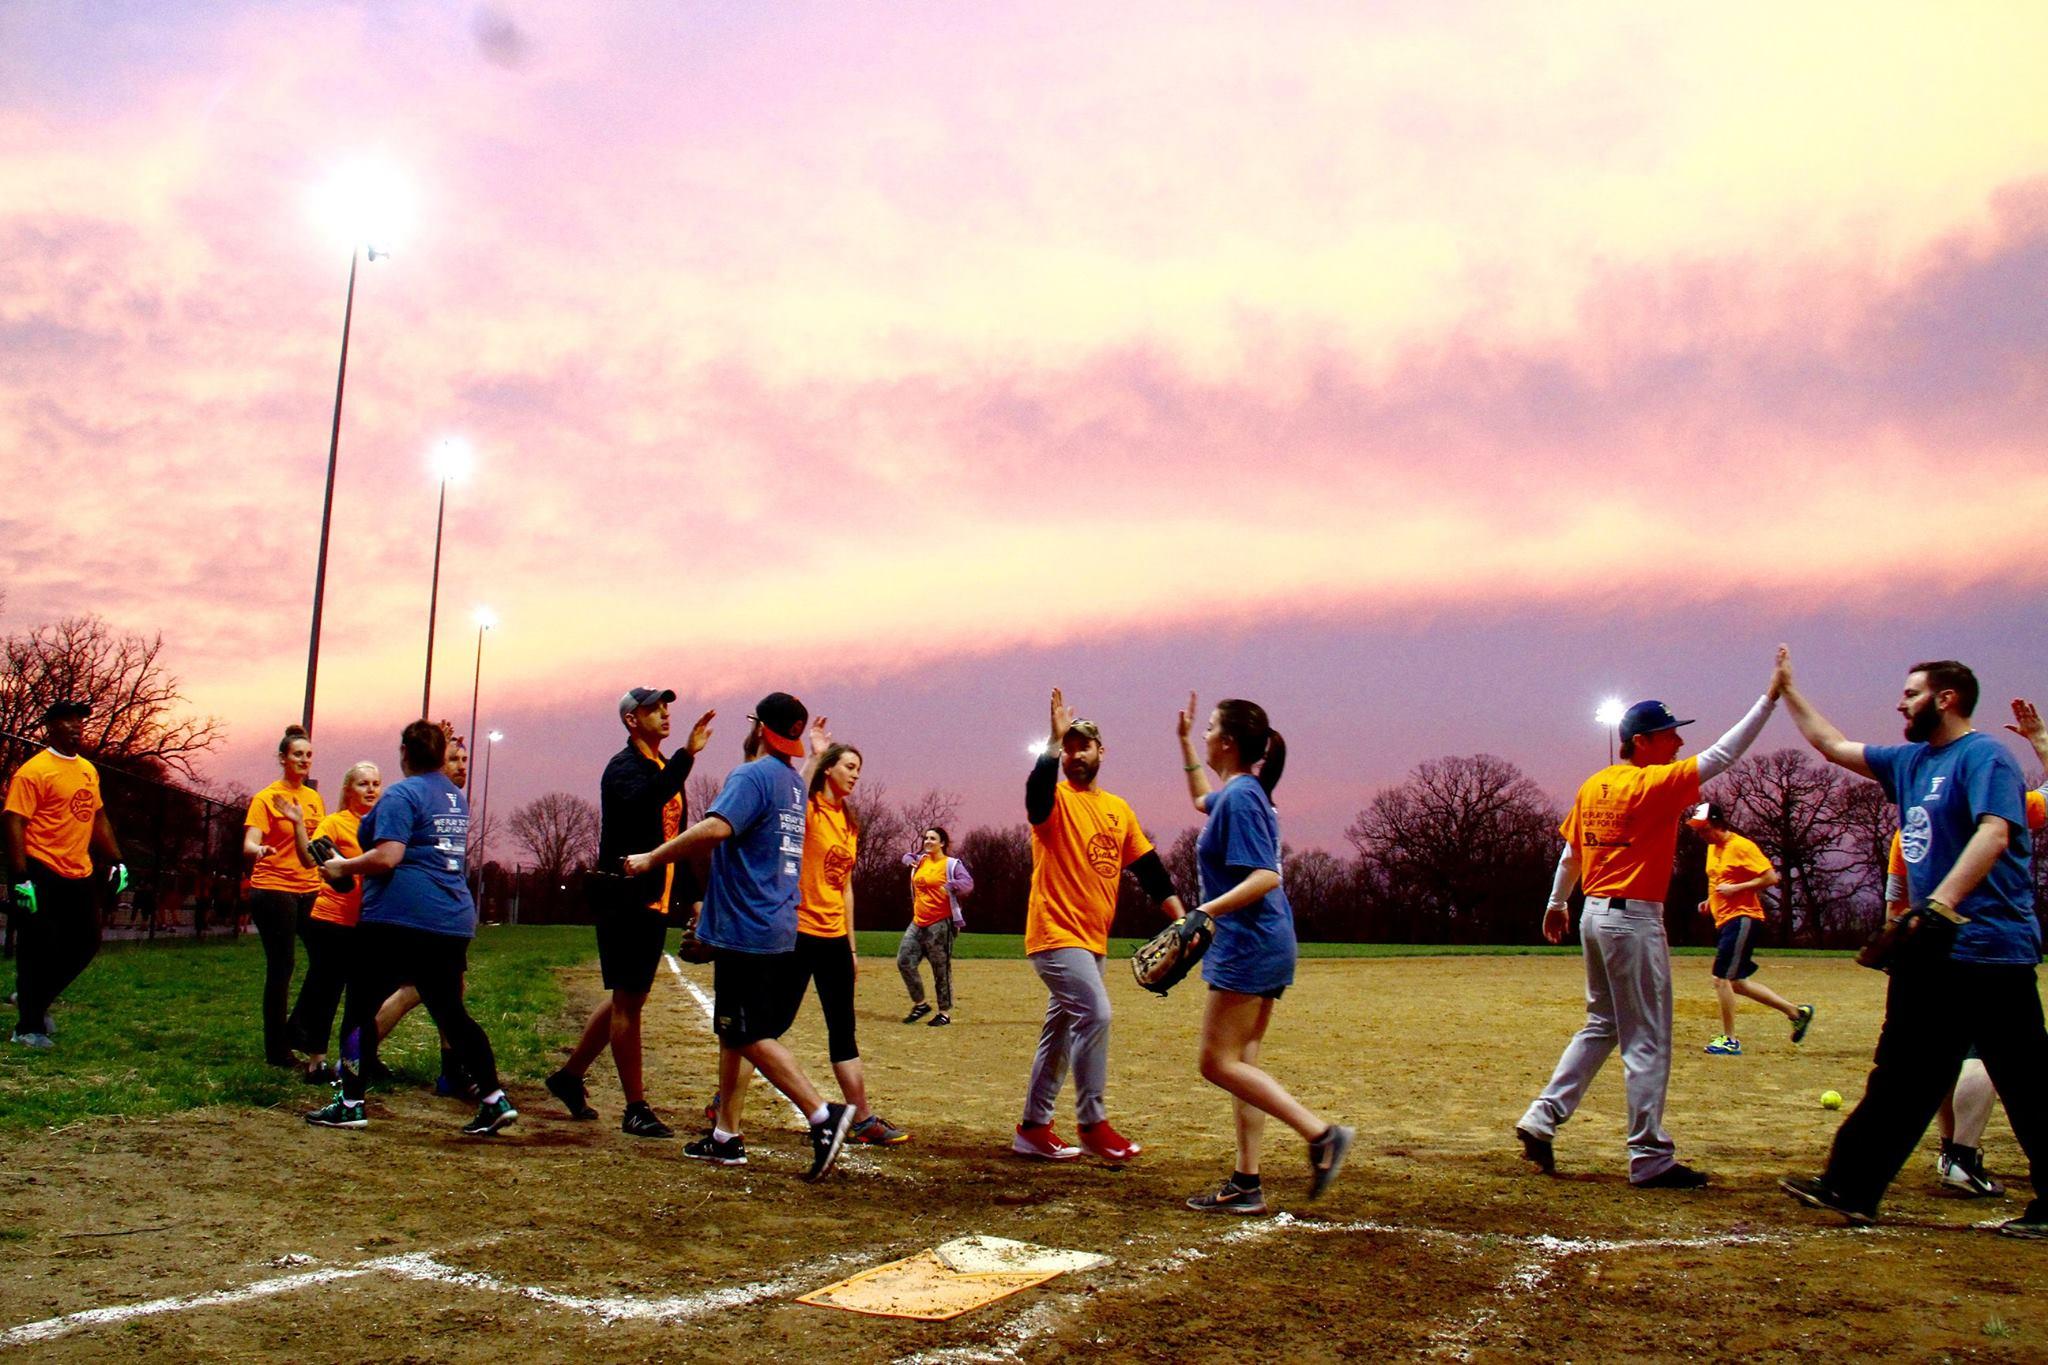 New York City Softball League - NYC Social Sports